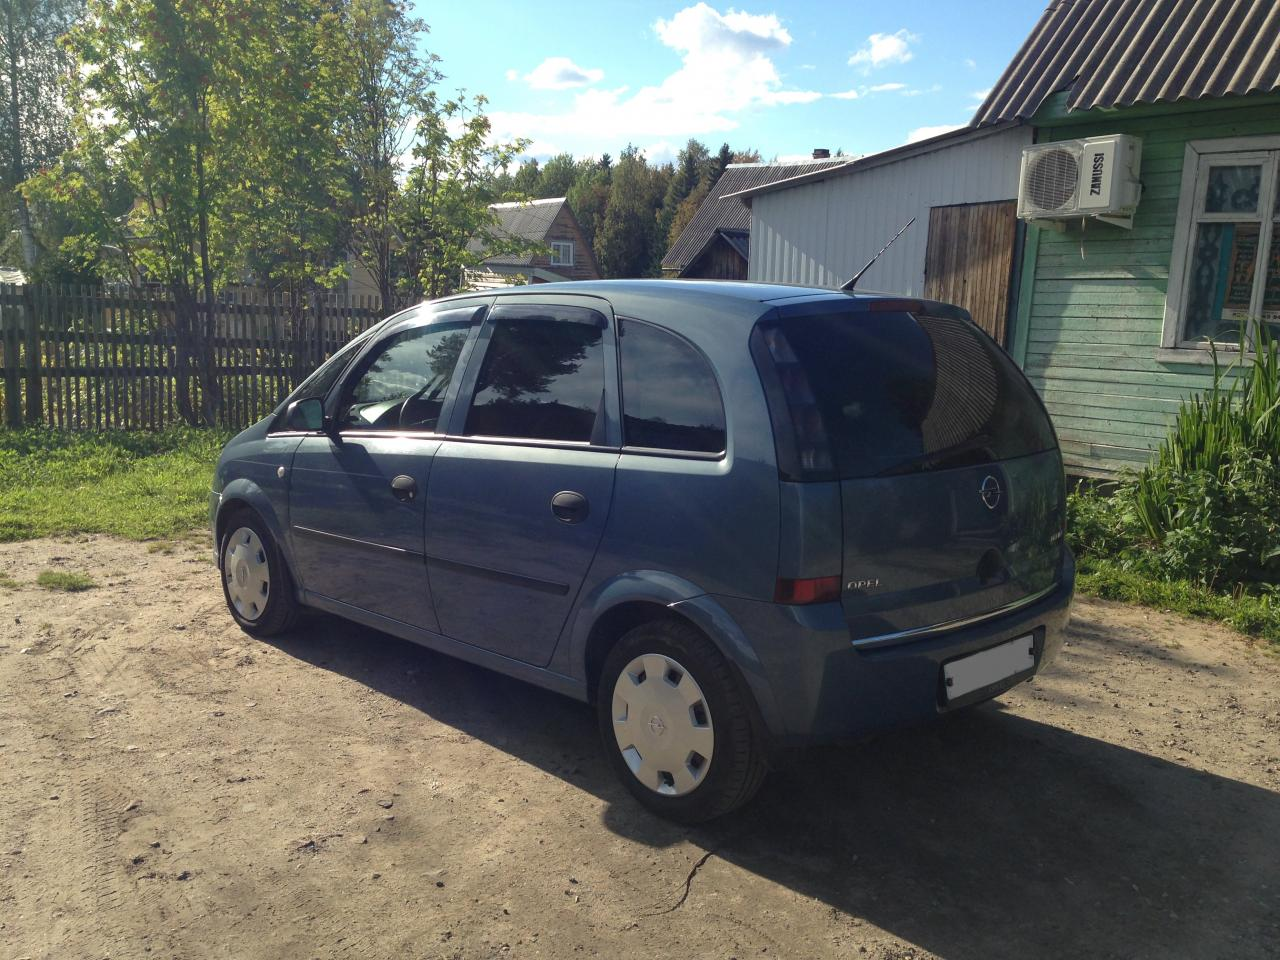 Opel Meriva 2007 г.в. г.Архангельск - фото 5